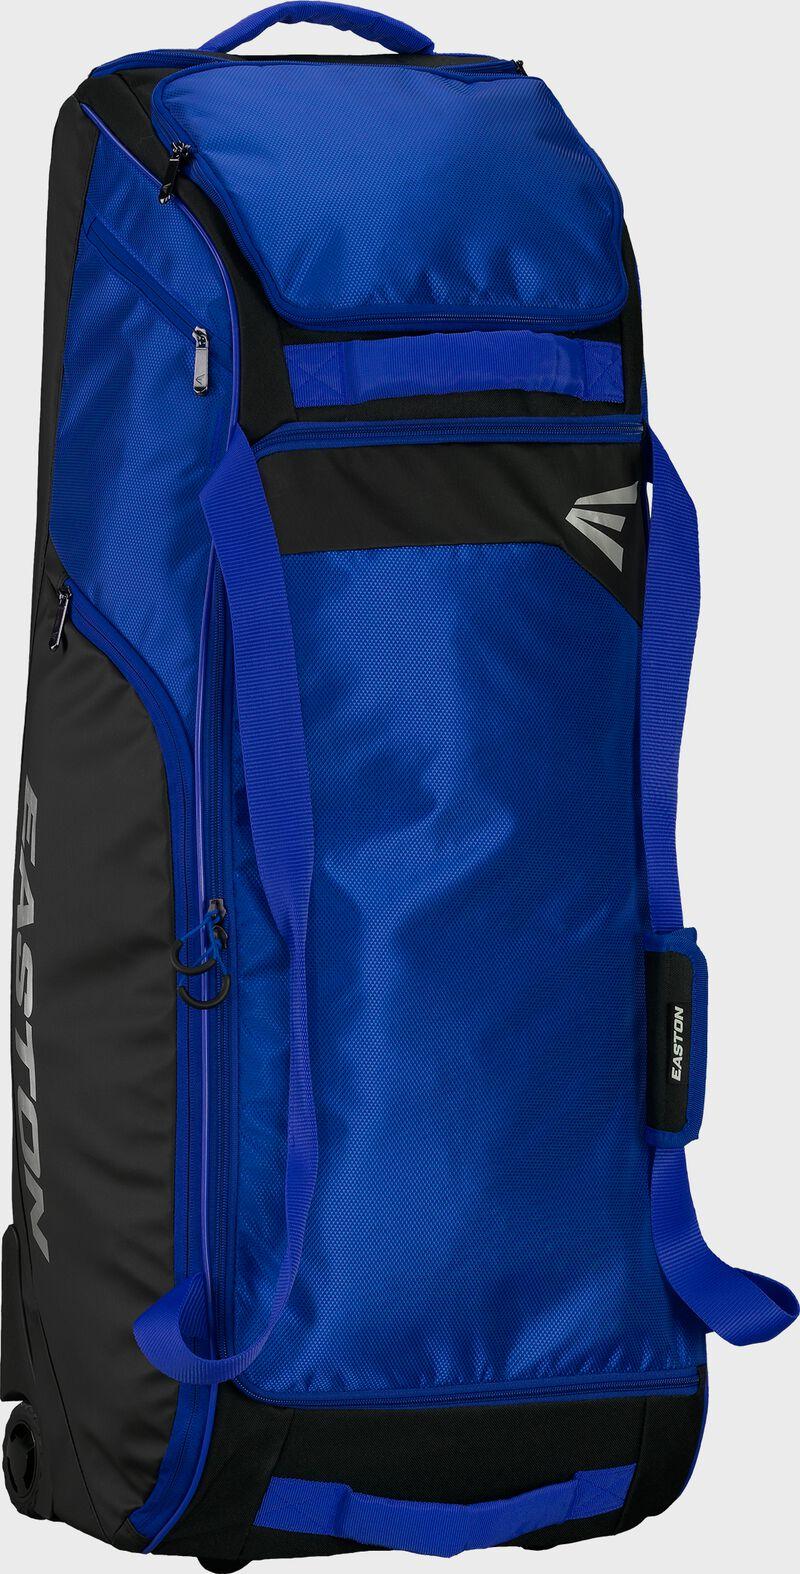 Dugout Wheeled Bag   RY